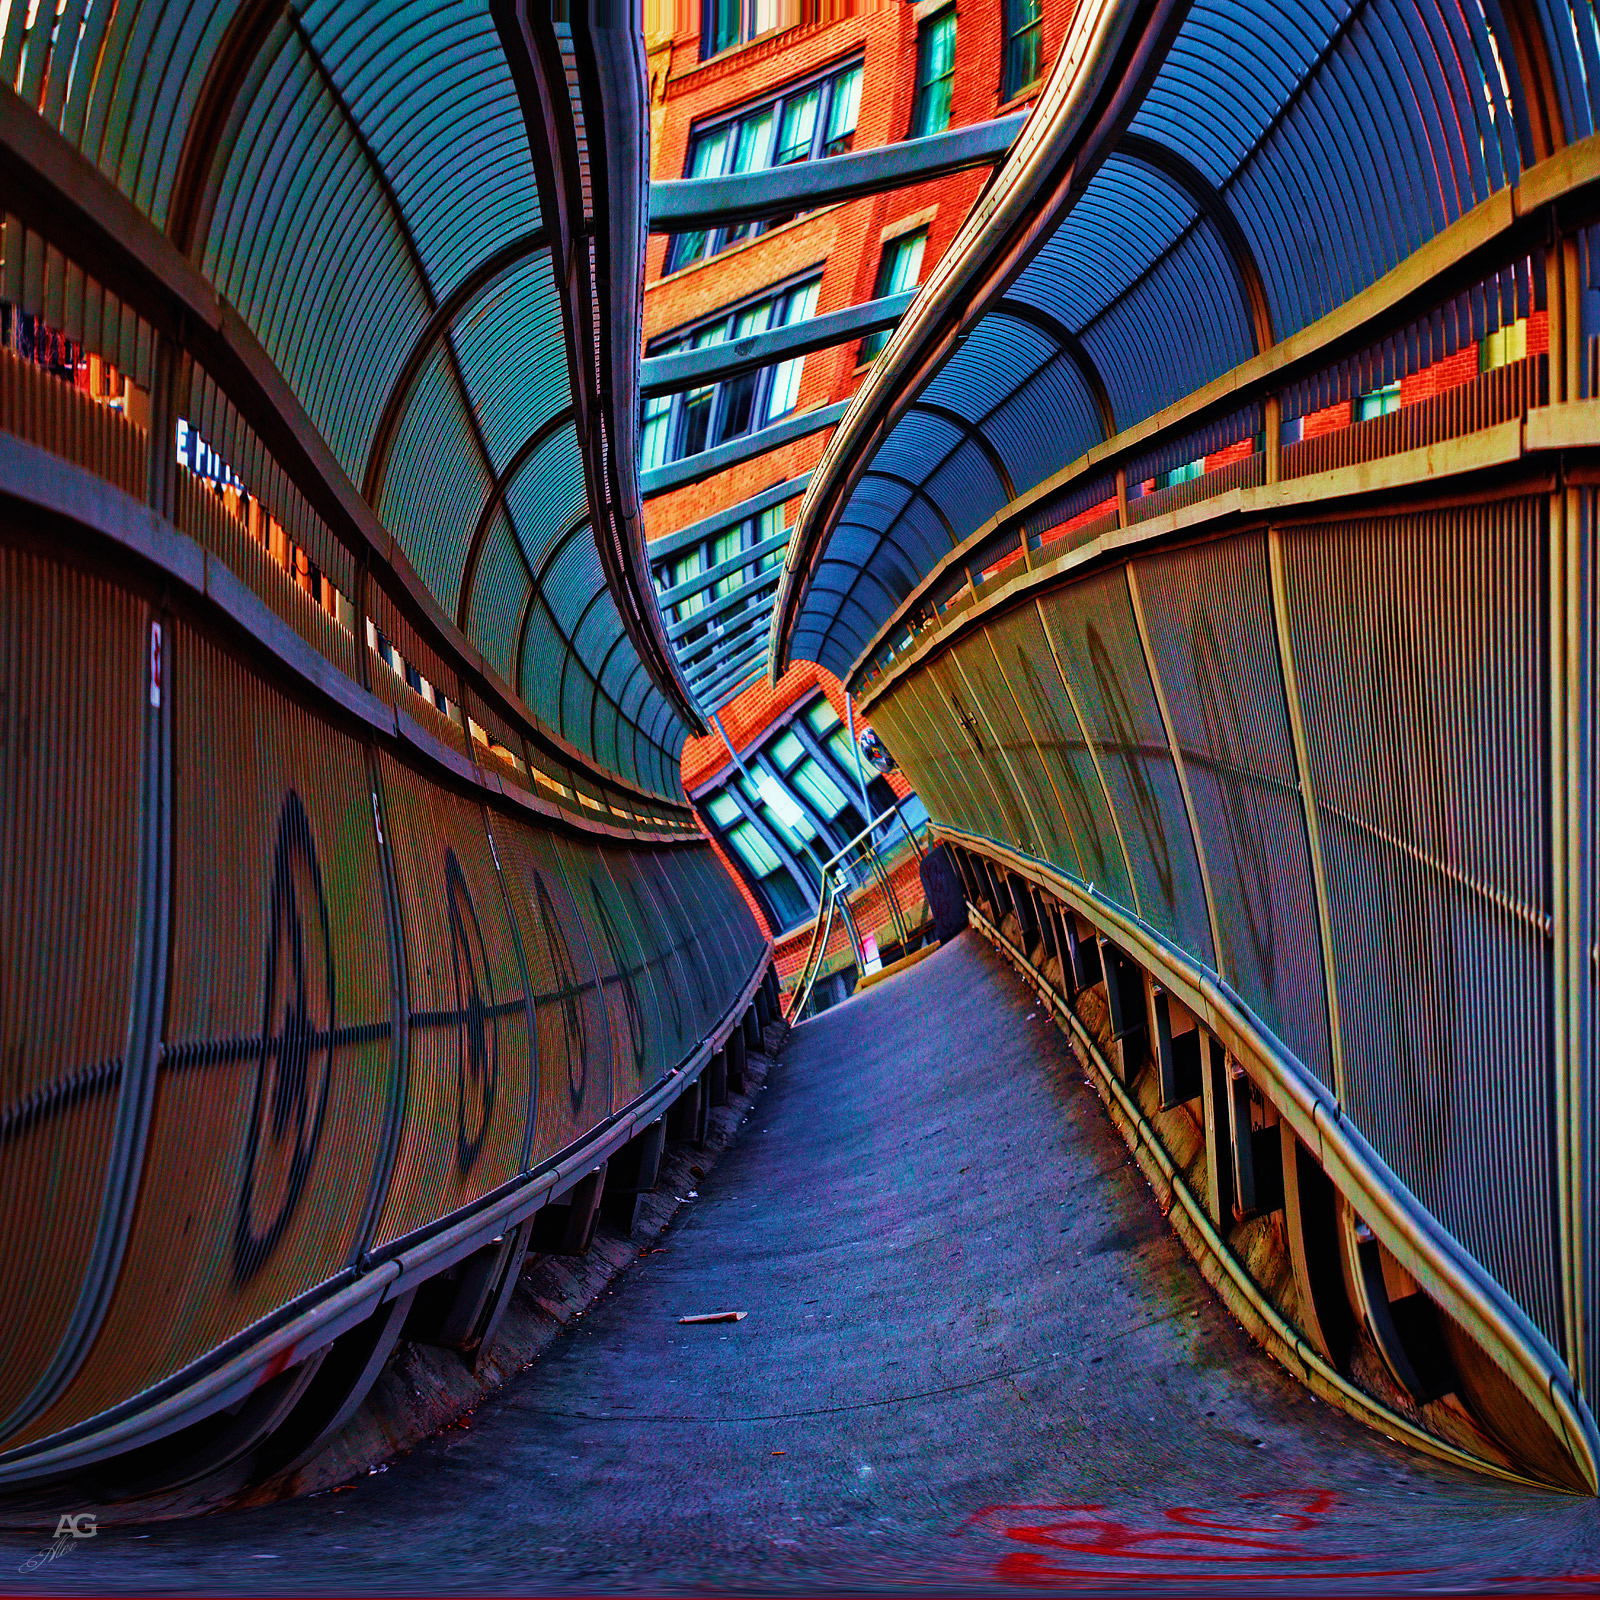 TunnelBridgeInManhattanDowntownNearCanalStreet_unfoldedTwisted_1600